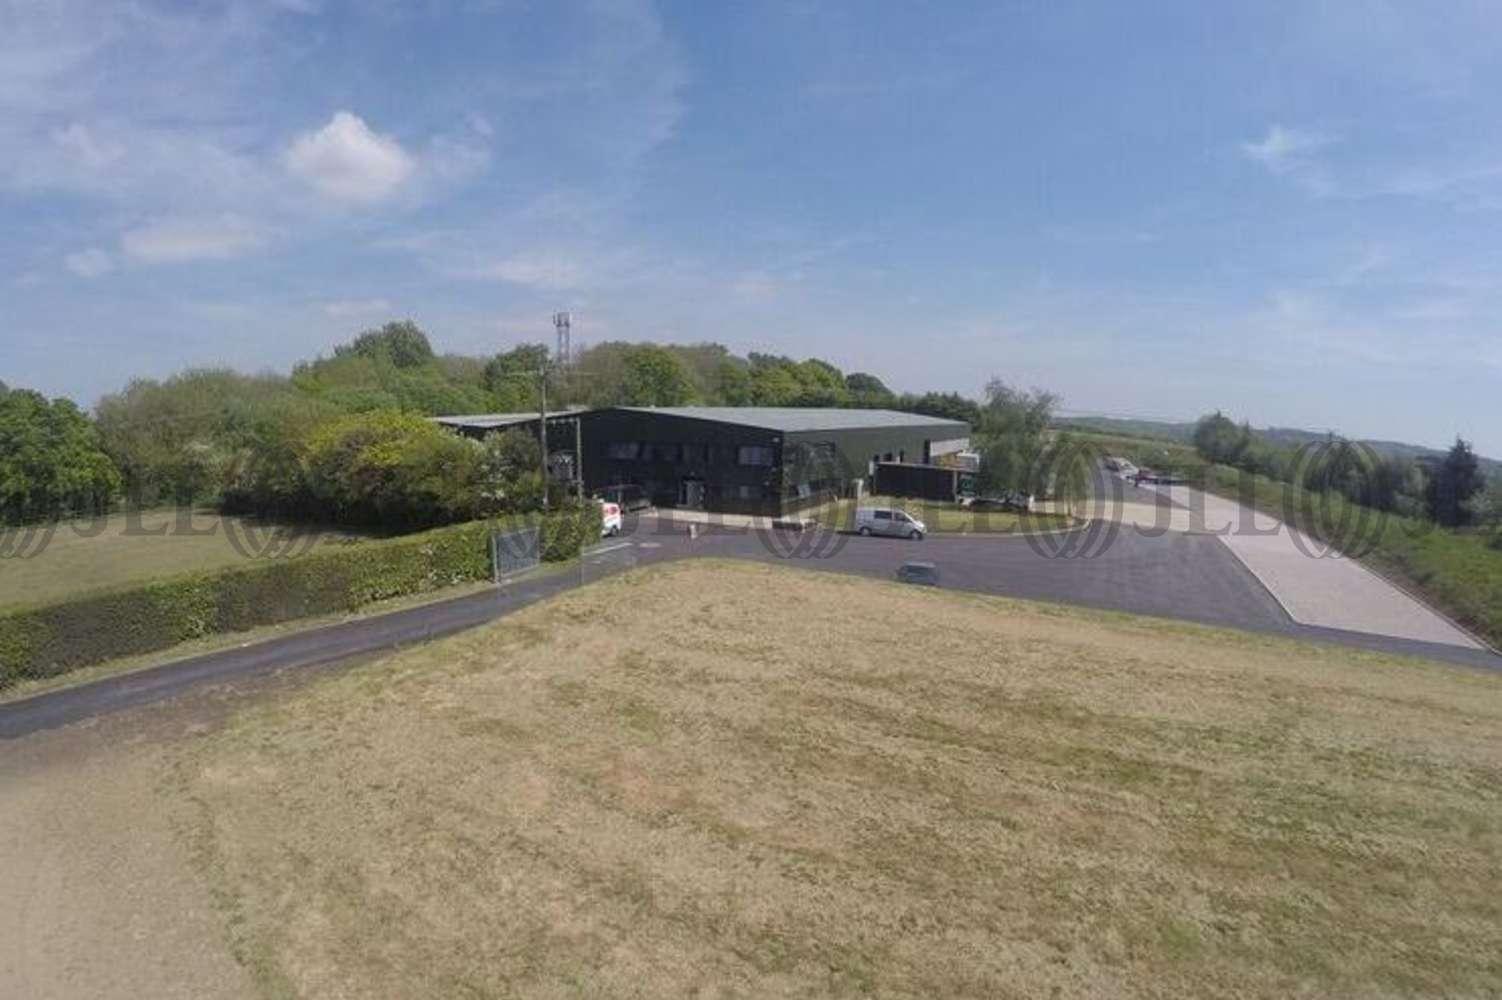 Industrial Southampton, SO32 2JQ - Ceejay Systems/Warwick Trailers - 2